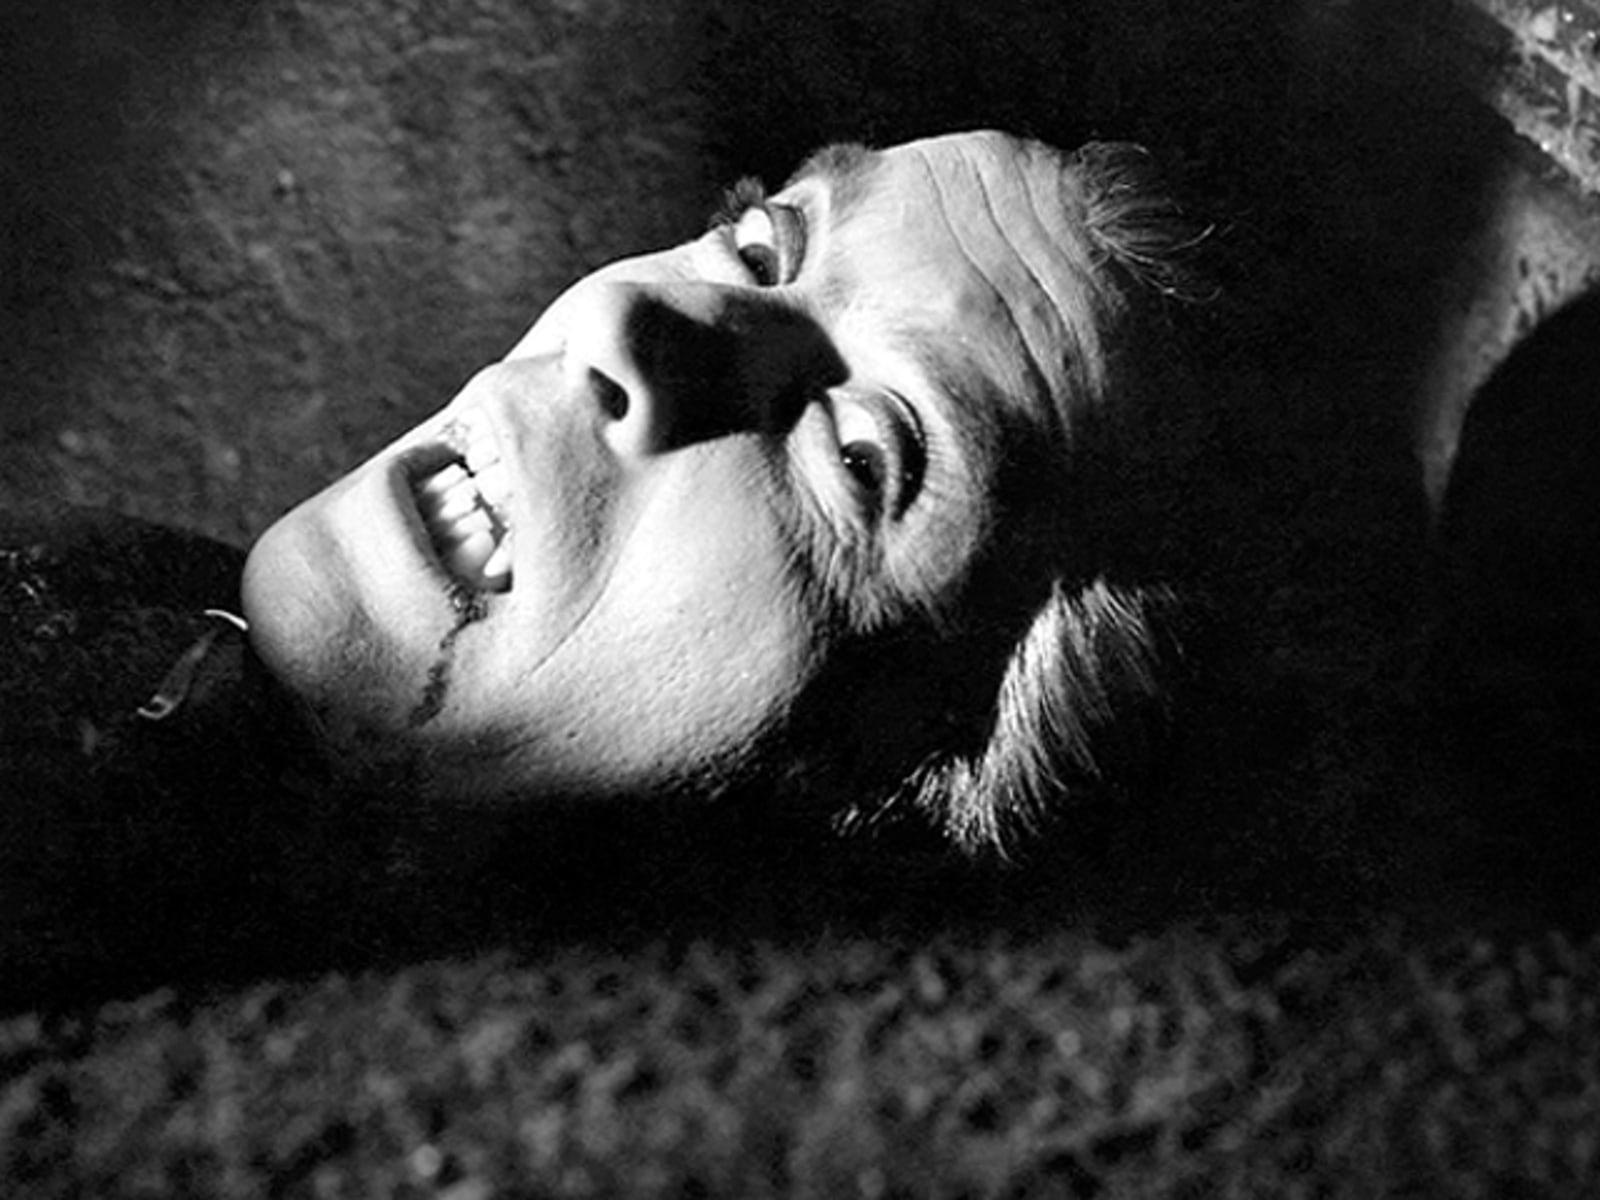 Image: Dracula